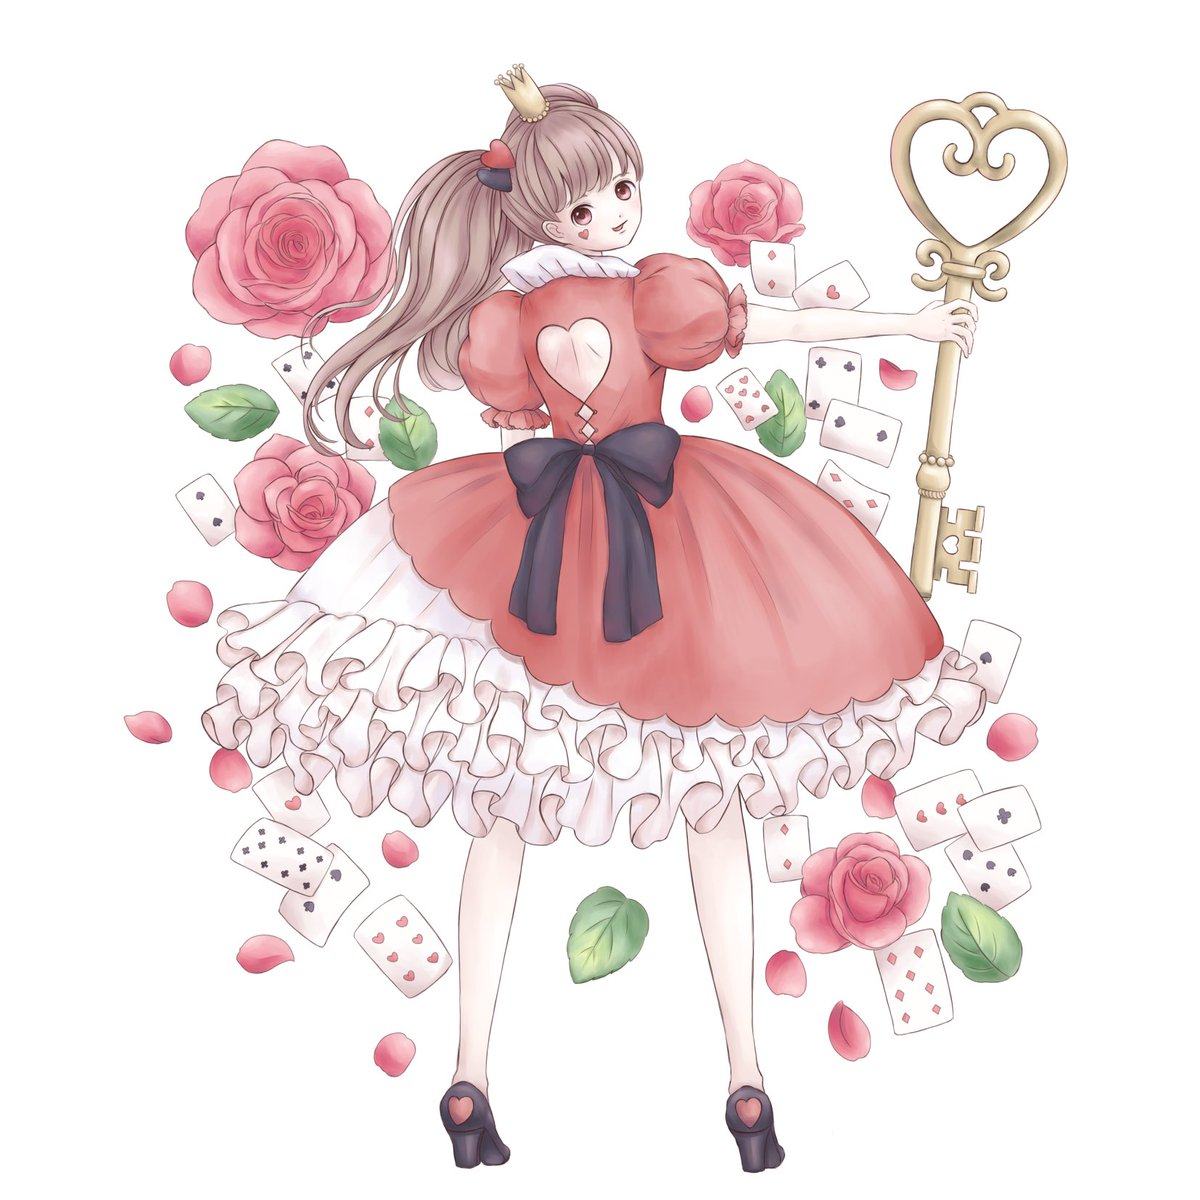 Queen of heart  #初夏の創作クラスタフォロー祭  #イラスト pic.twitter.com/vNDPvf8SJS